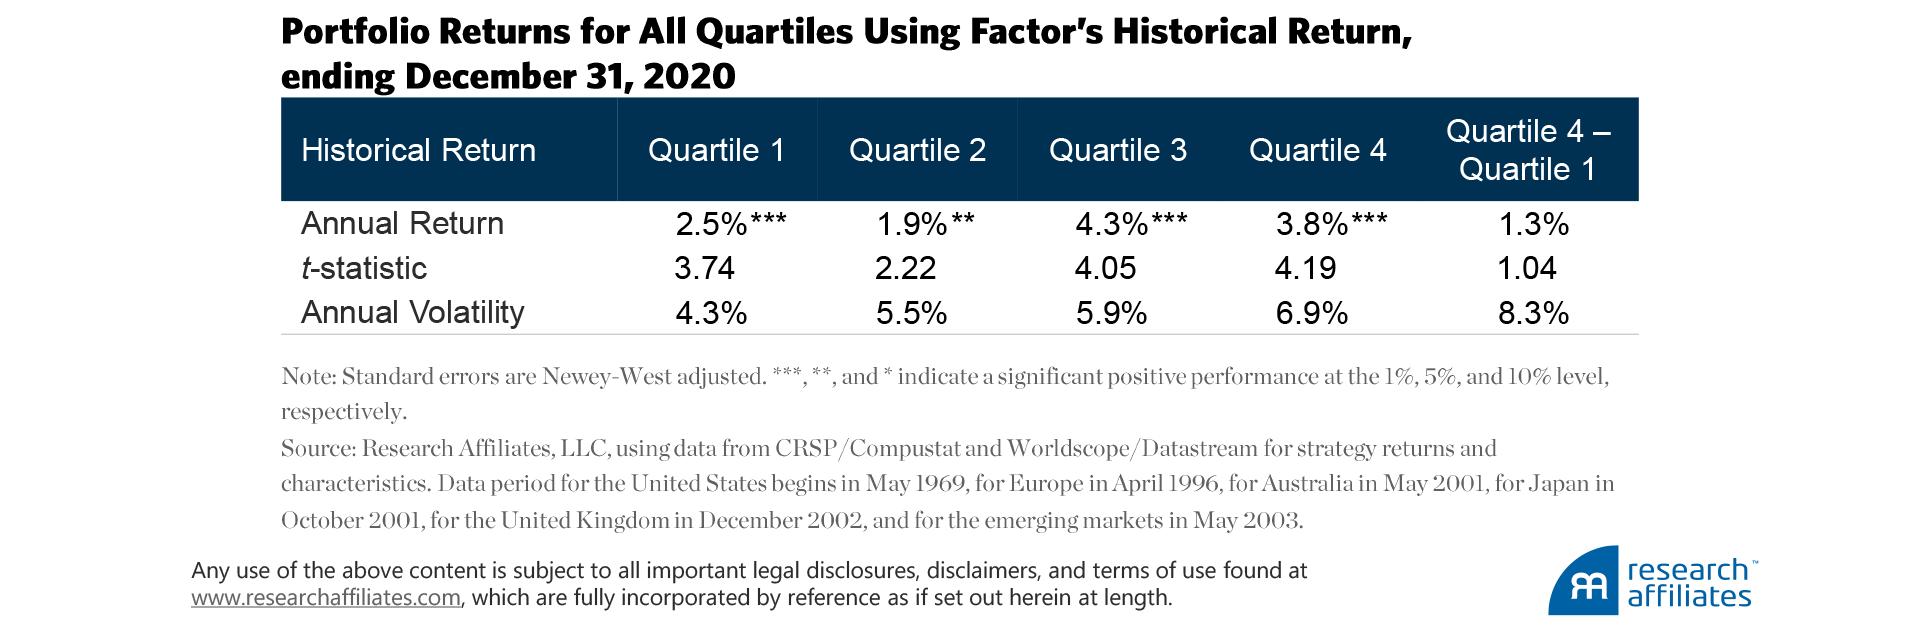 https://www.researchaffiliates.com/content/dam/ra/publications/figures/828-factor-timing-keep-it-simple/828-factor-timing-keep-it-simple-table-1.png